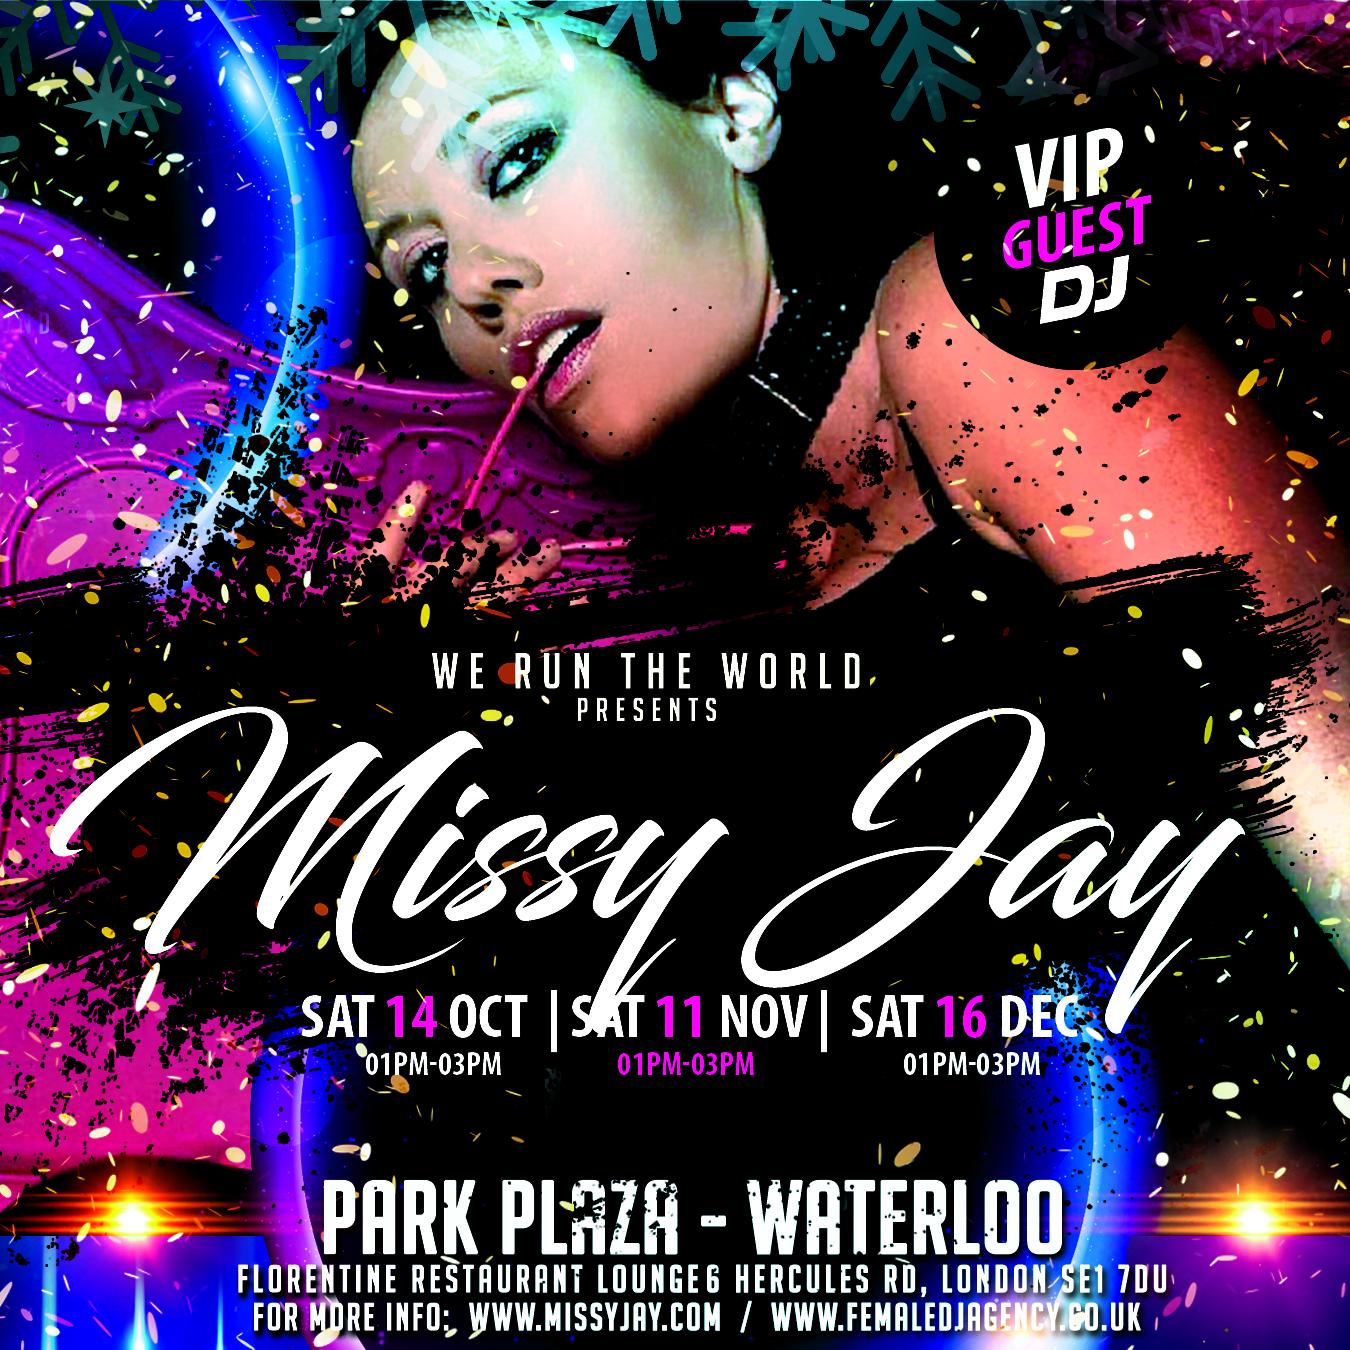 missy_jay_park_plaza_101112.jpg